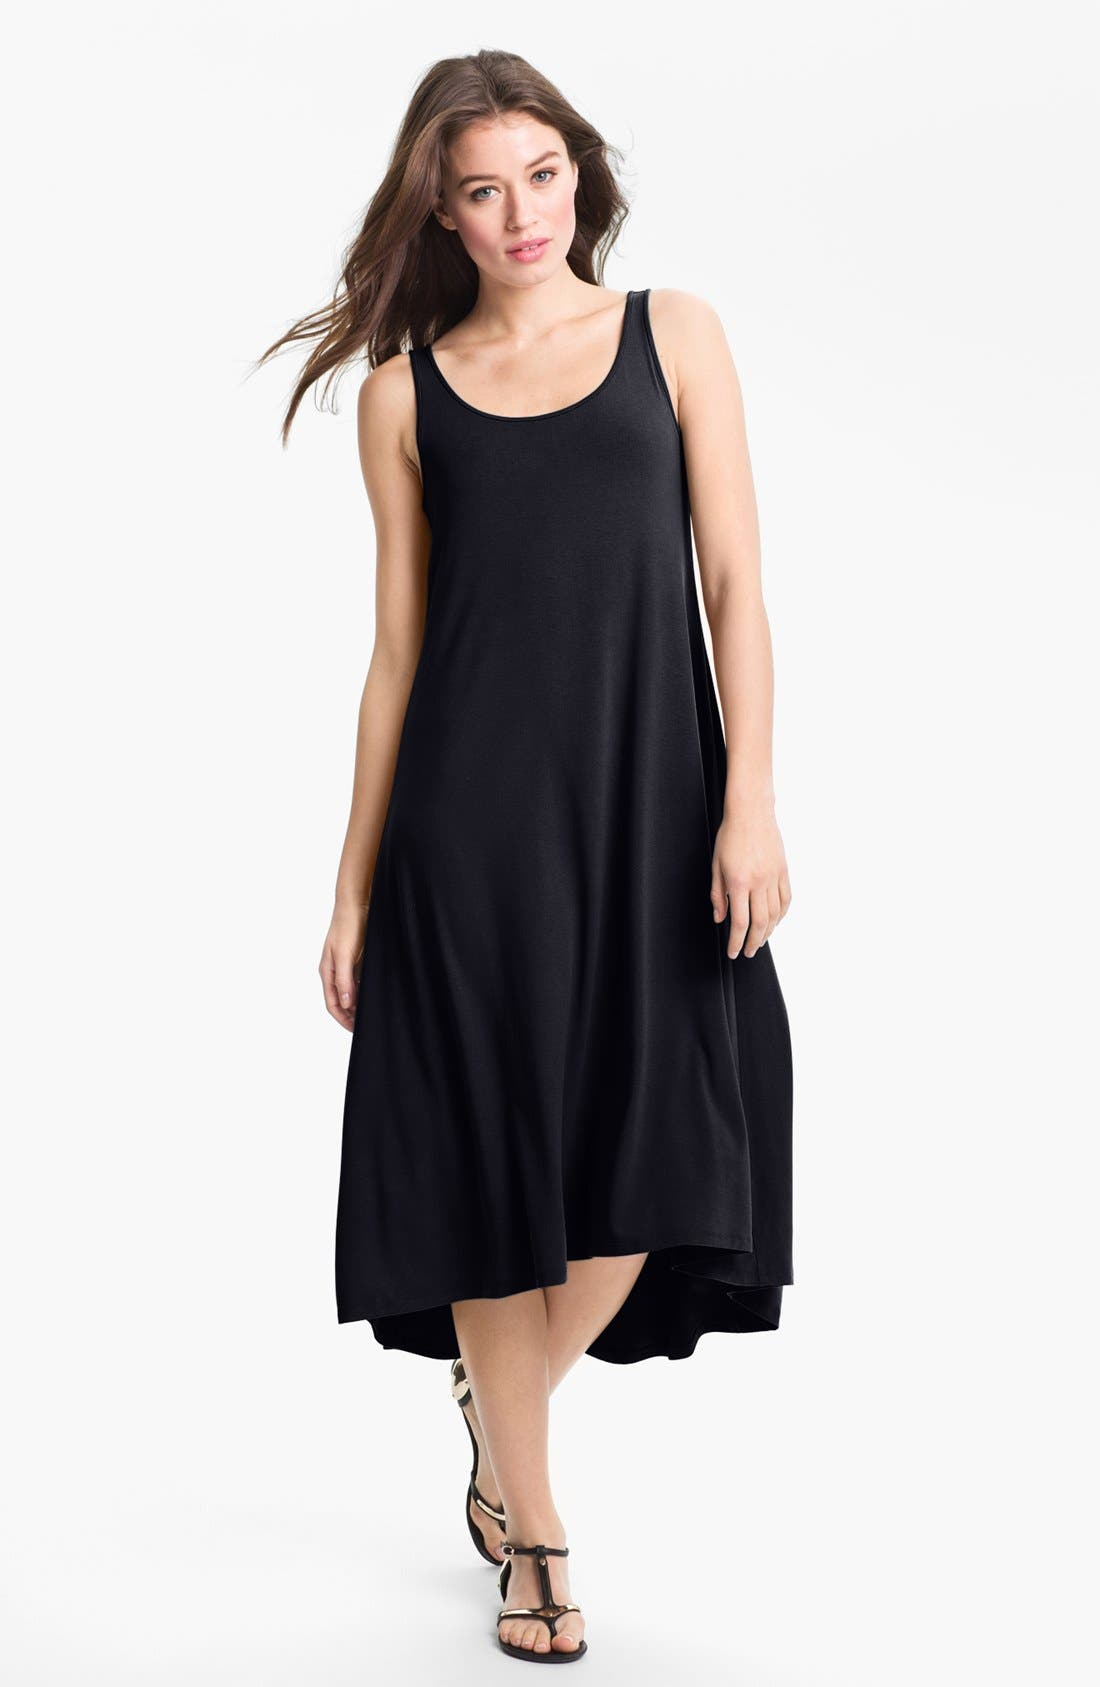 Main Image - Eileen Fisher Scoop Neck Tank Dress